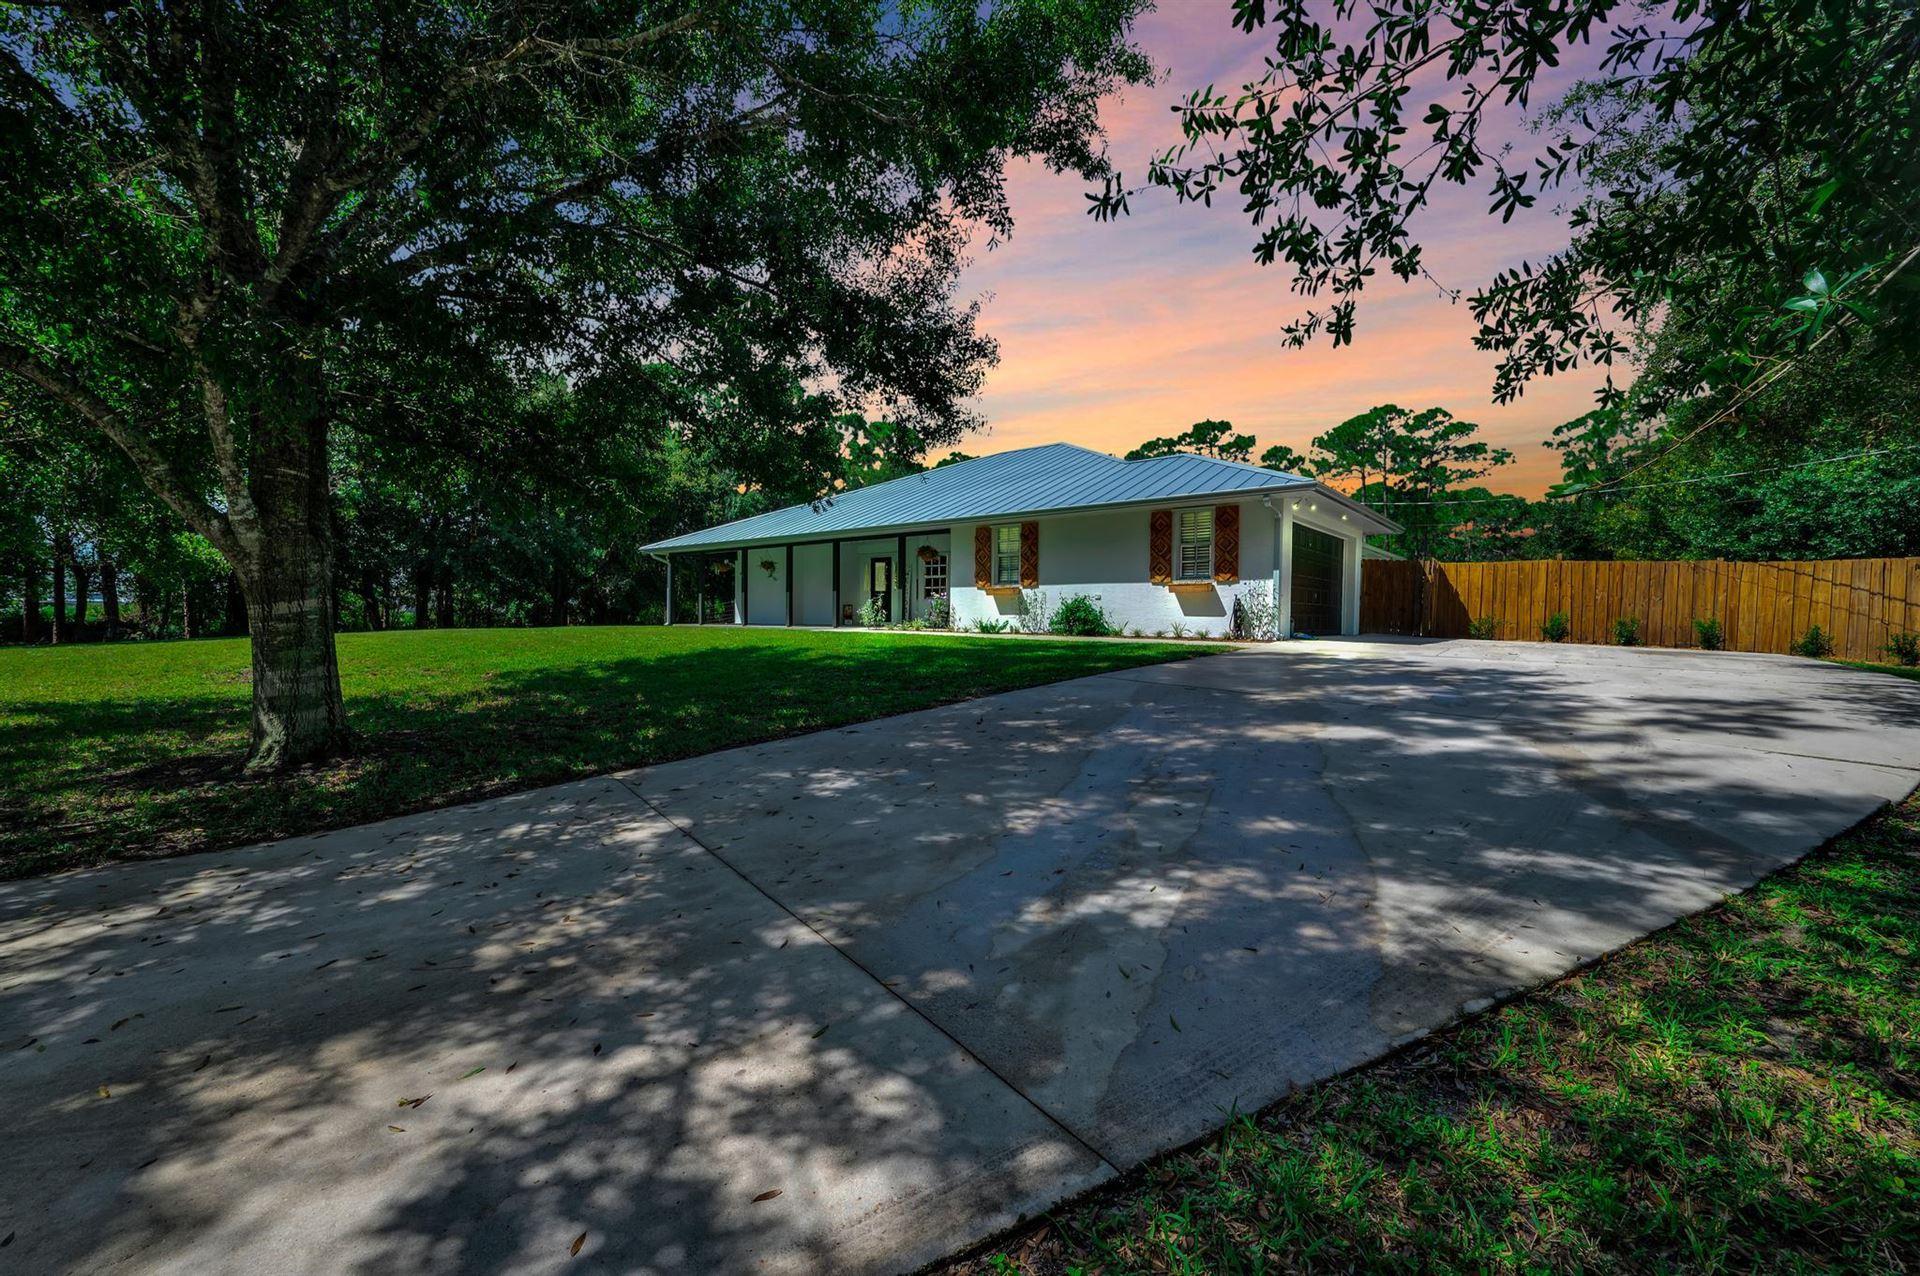 Photo of 101 S Cardinal Place, Fort Pierce, FL 34945 (MLS # RX-10746591)